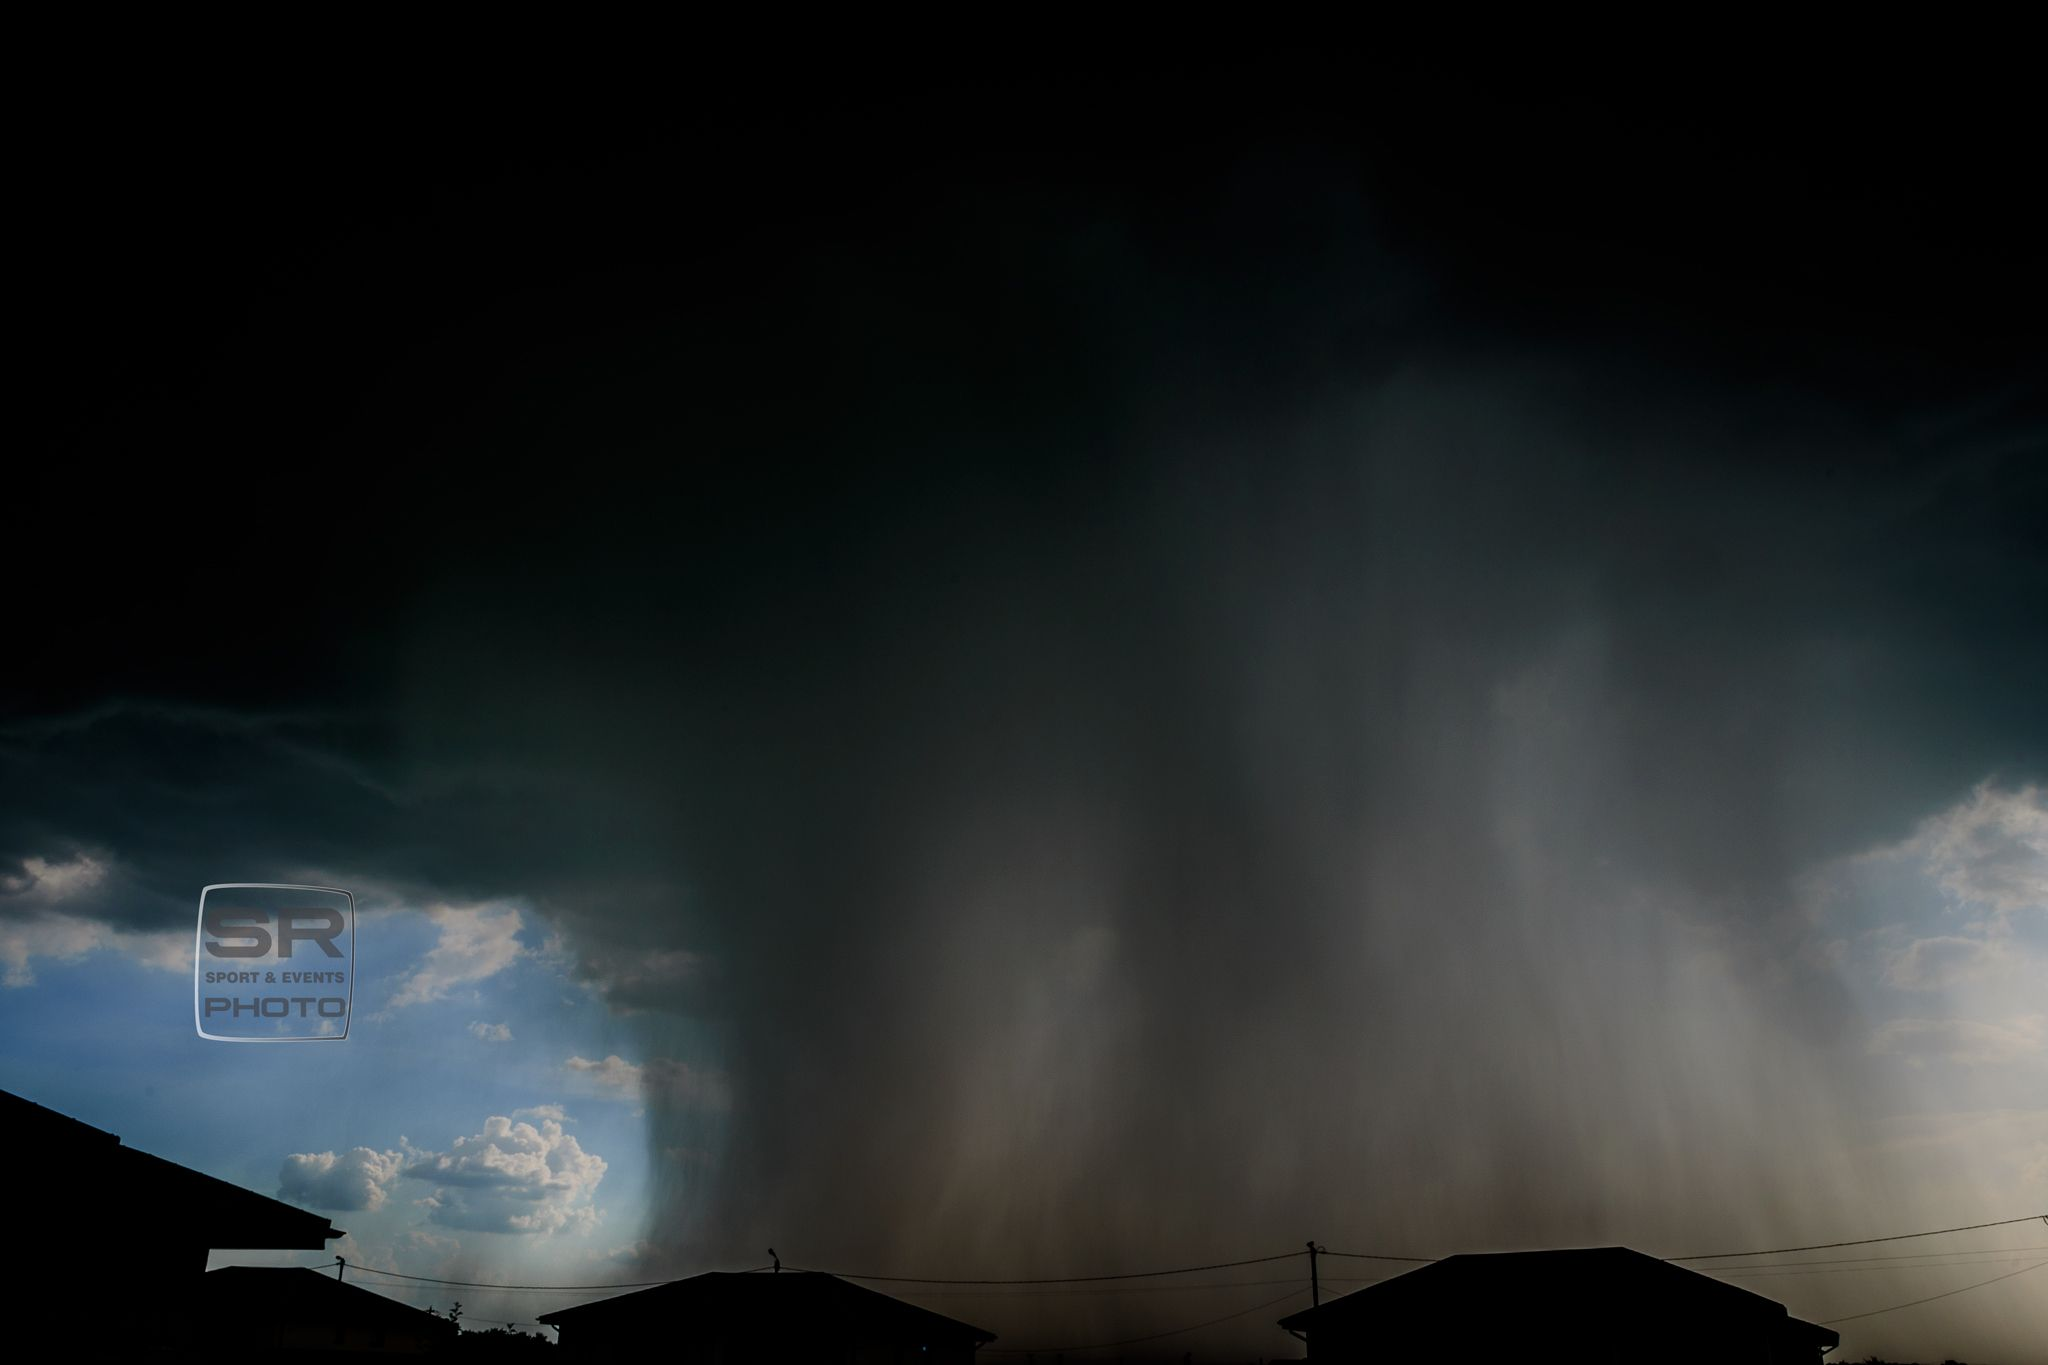 fotograf fotografie furtuna vartej turbion natura landscape